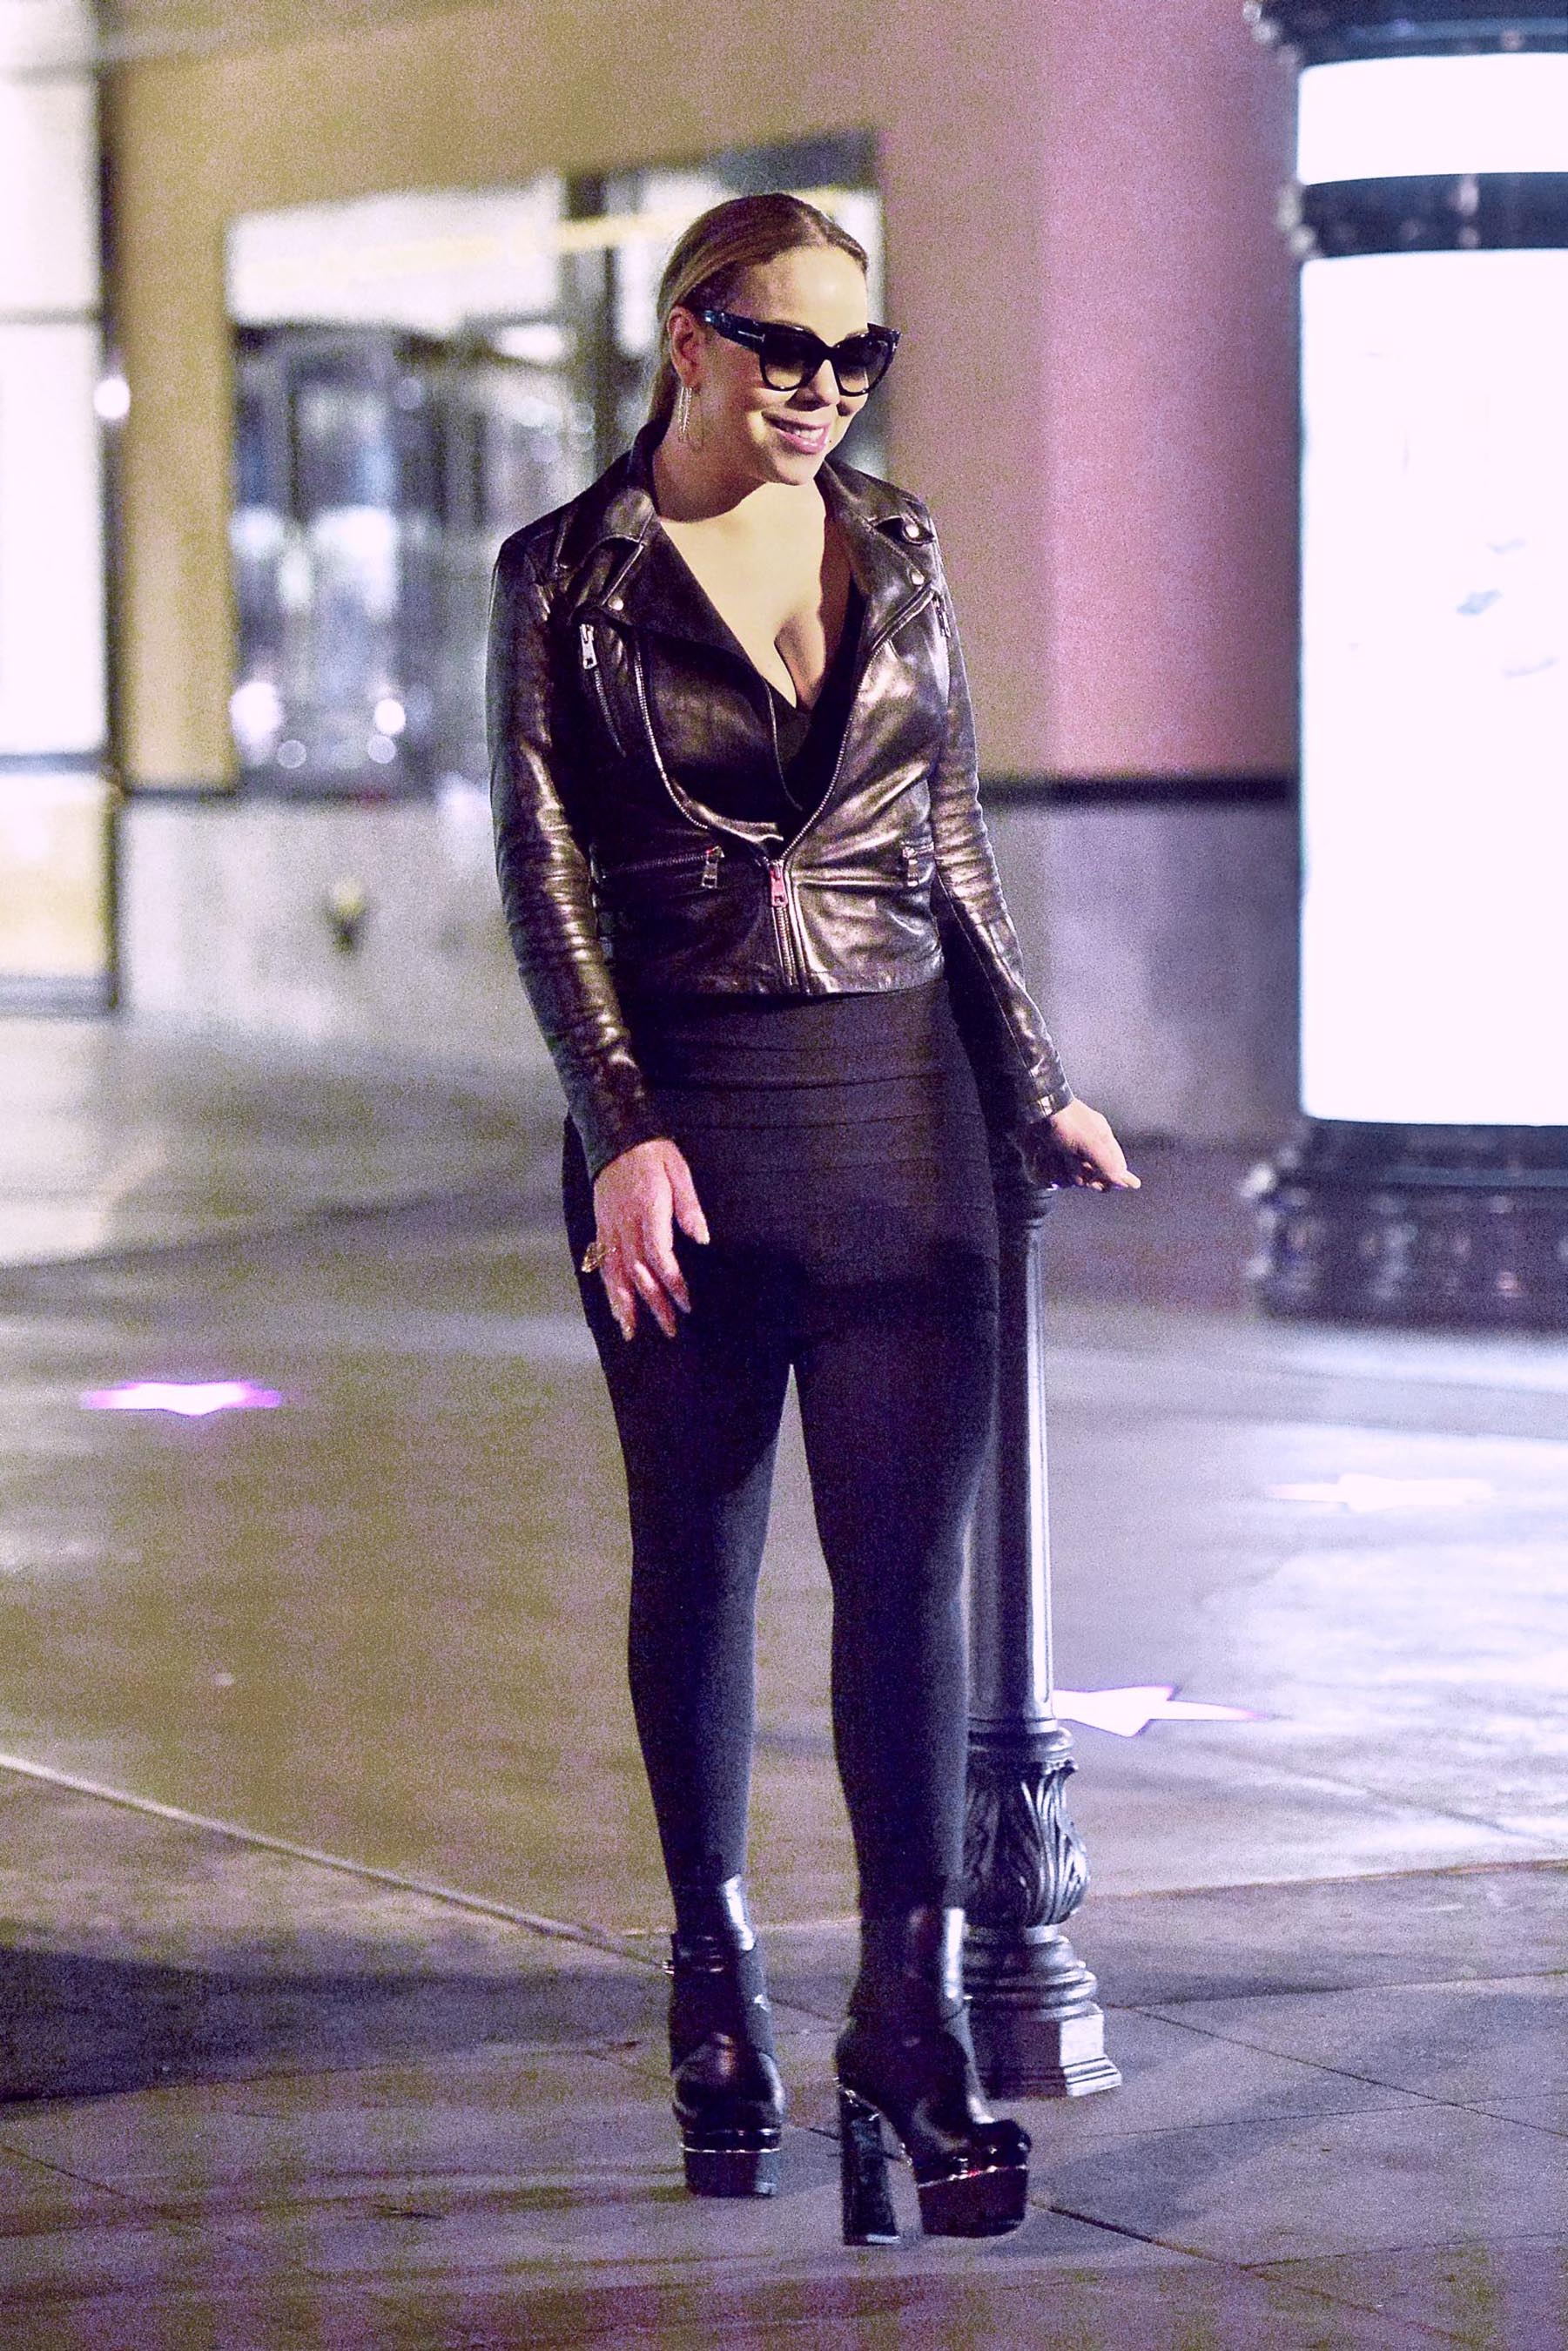 Mariah Carey at the movies in LA